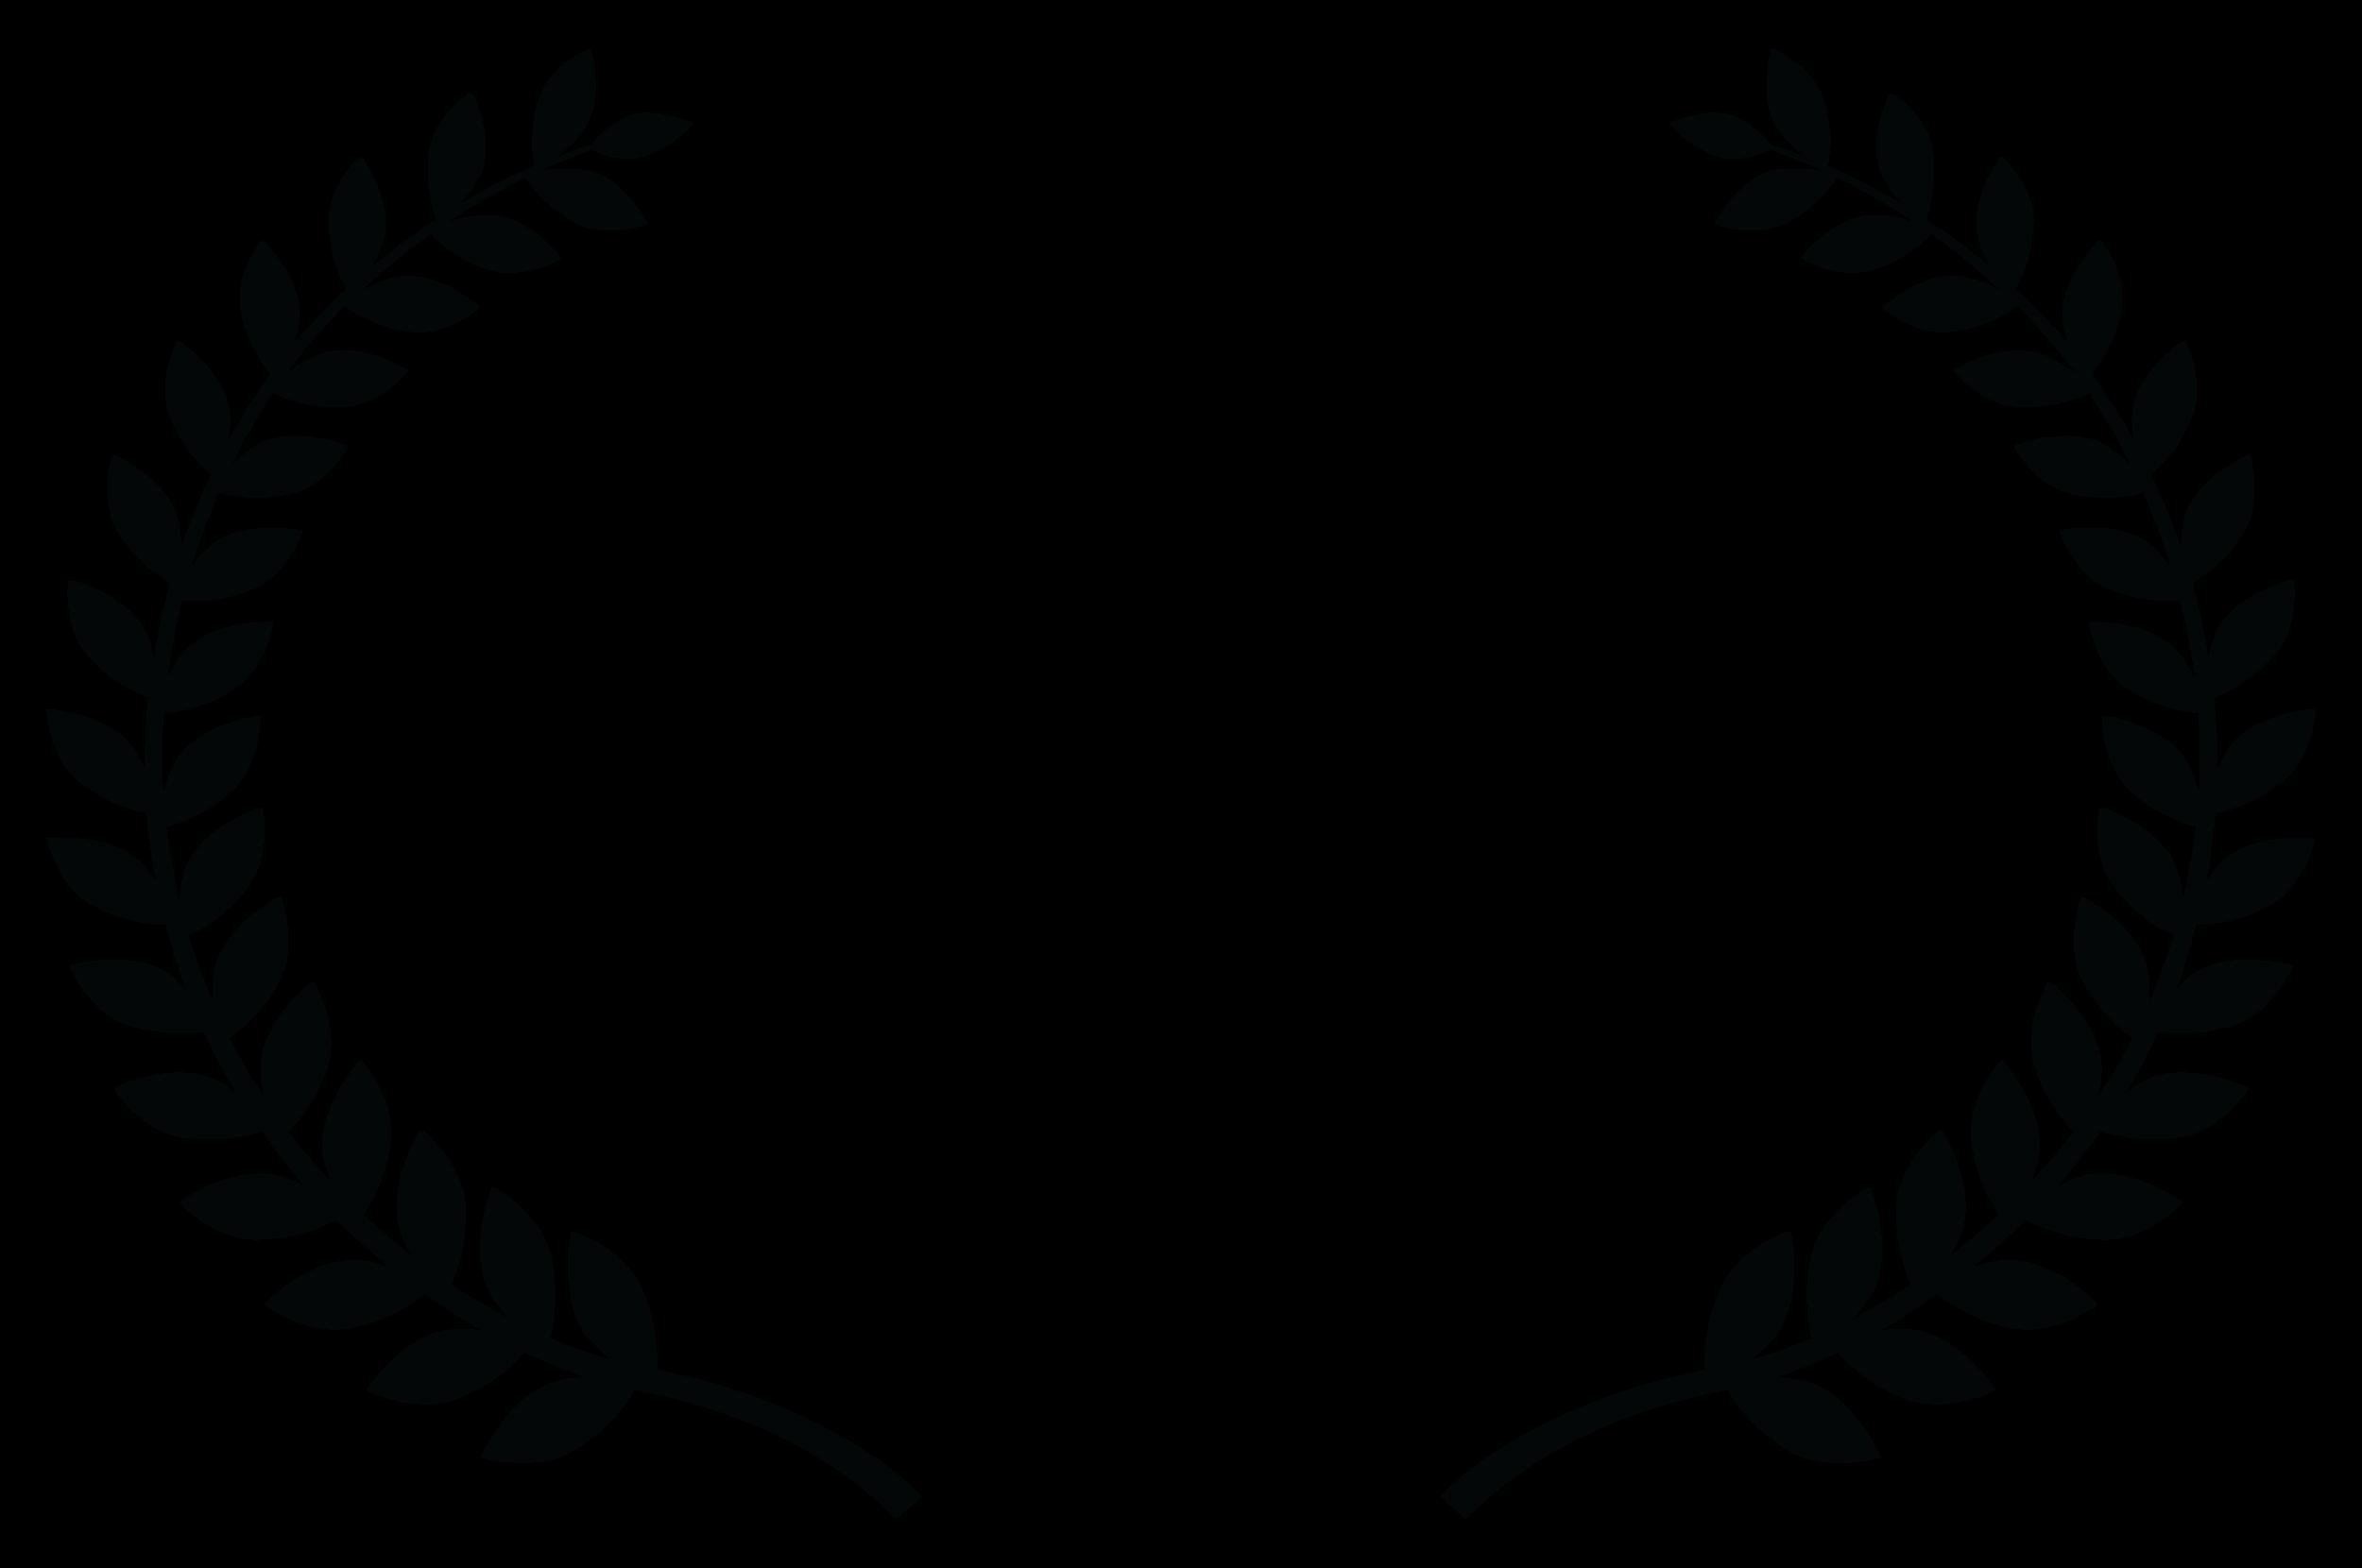 OFFICIALSELECTION-PortlandEcoFilmFestival-2019.png